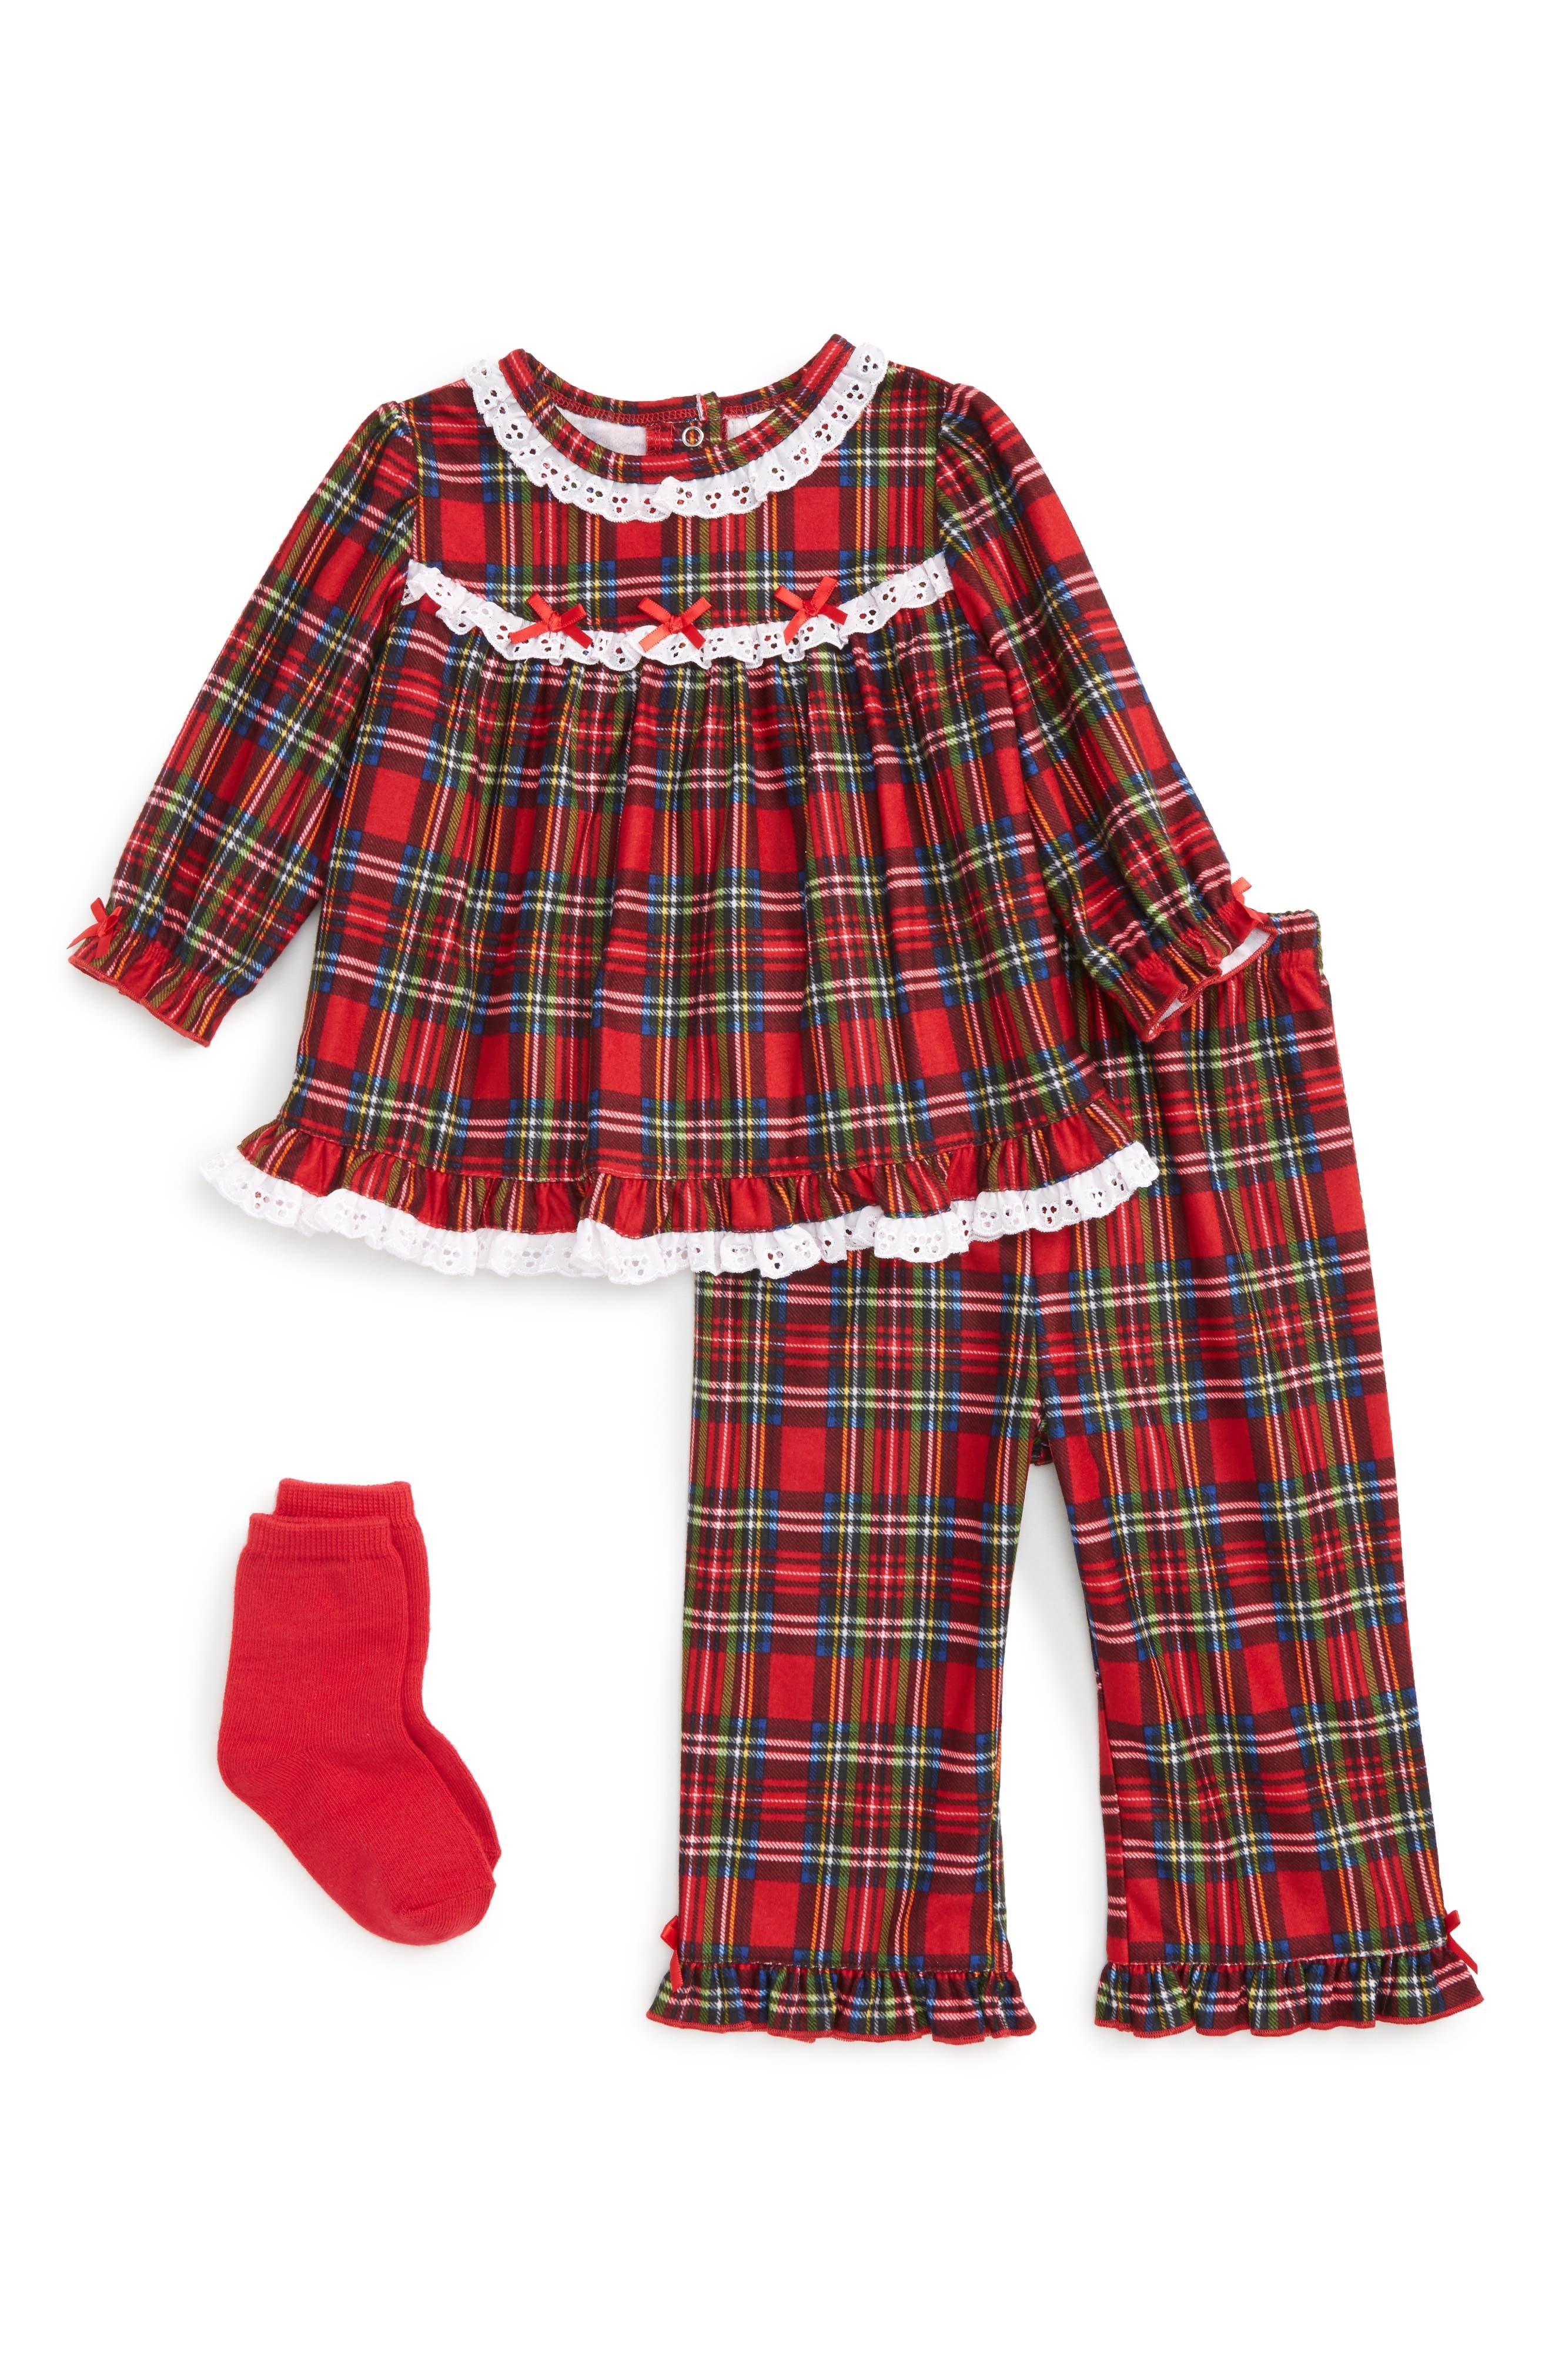 Toddler girl fashion dresses